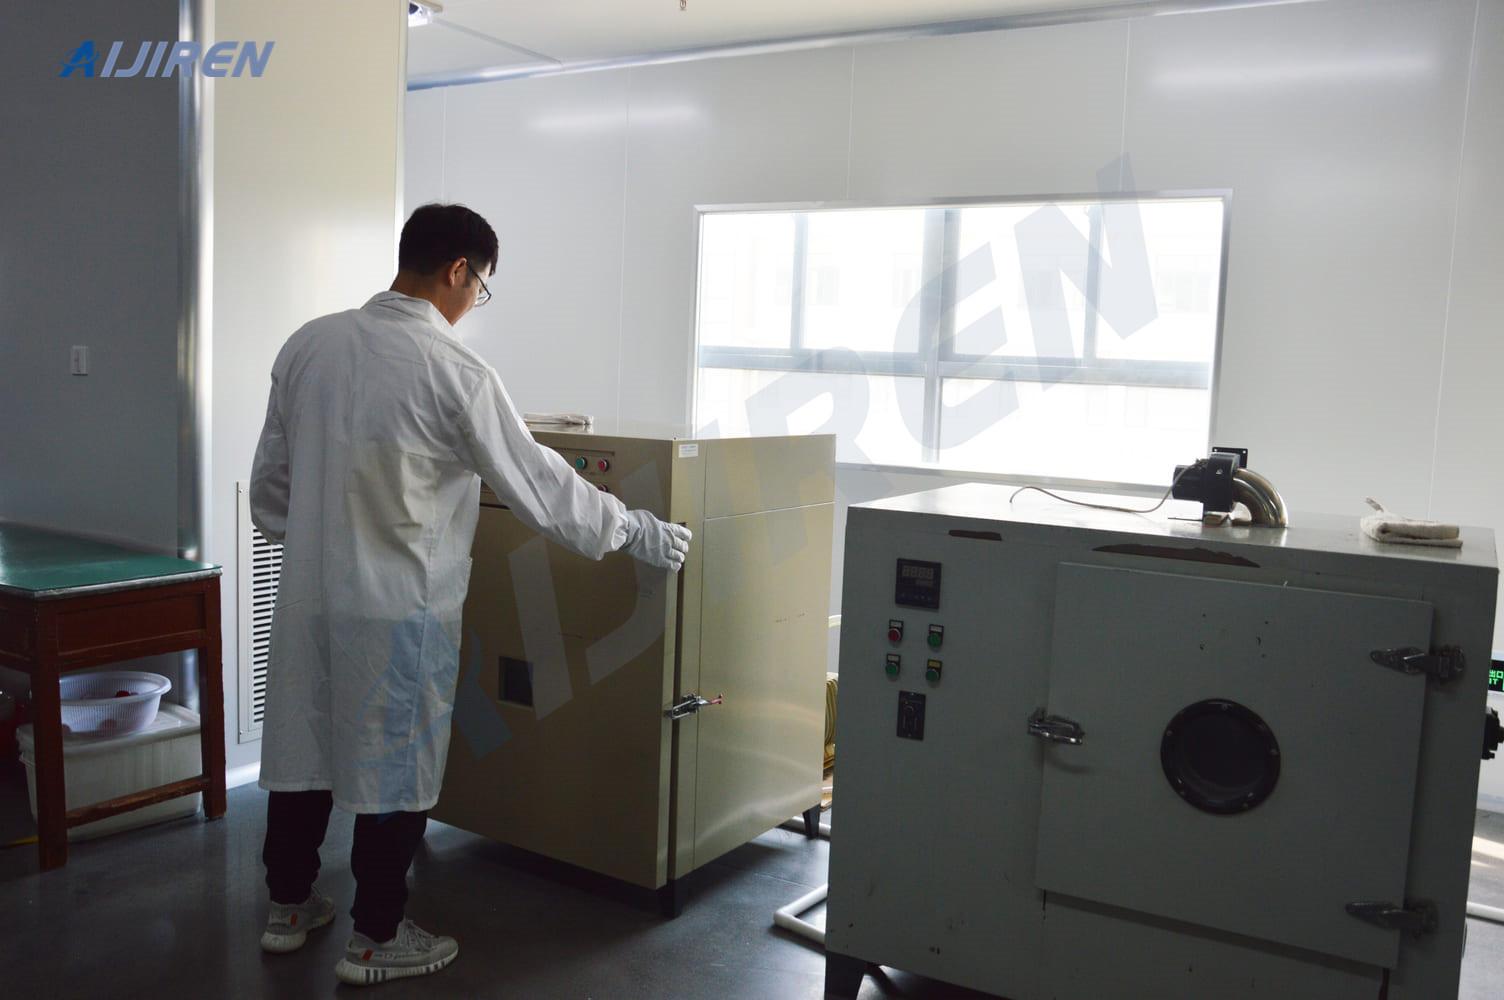 20ml headspace vialSepta of Autosampler Vial is Drying